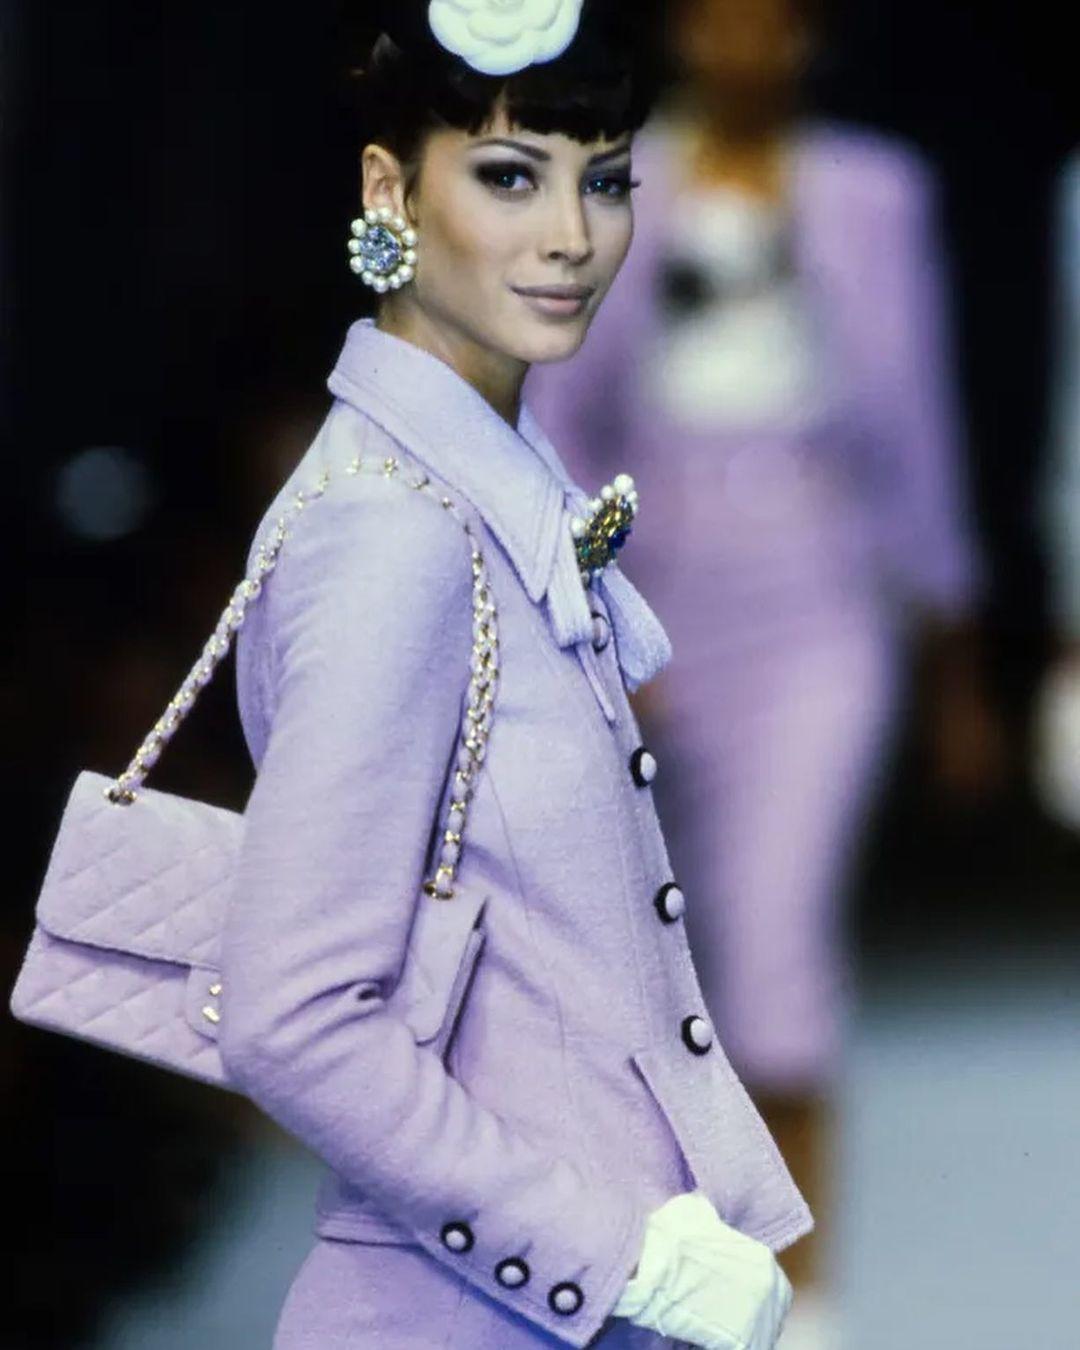 Серьги Chanel с крупным кабошоном Aurora Borealis и жемчугом 1992 г.